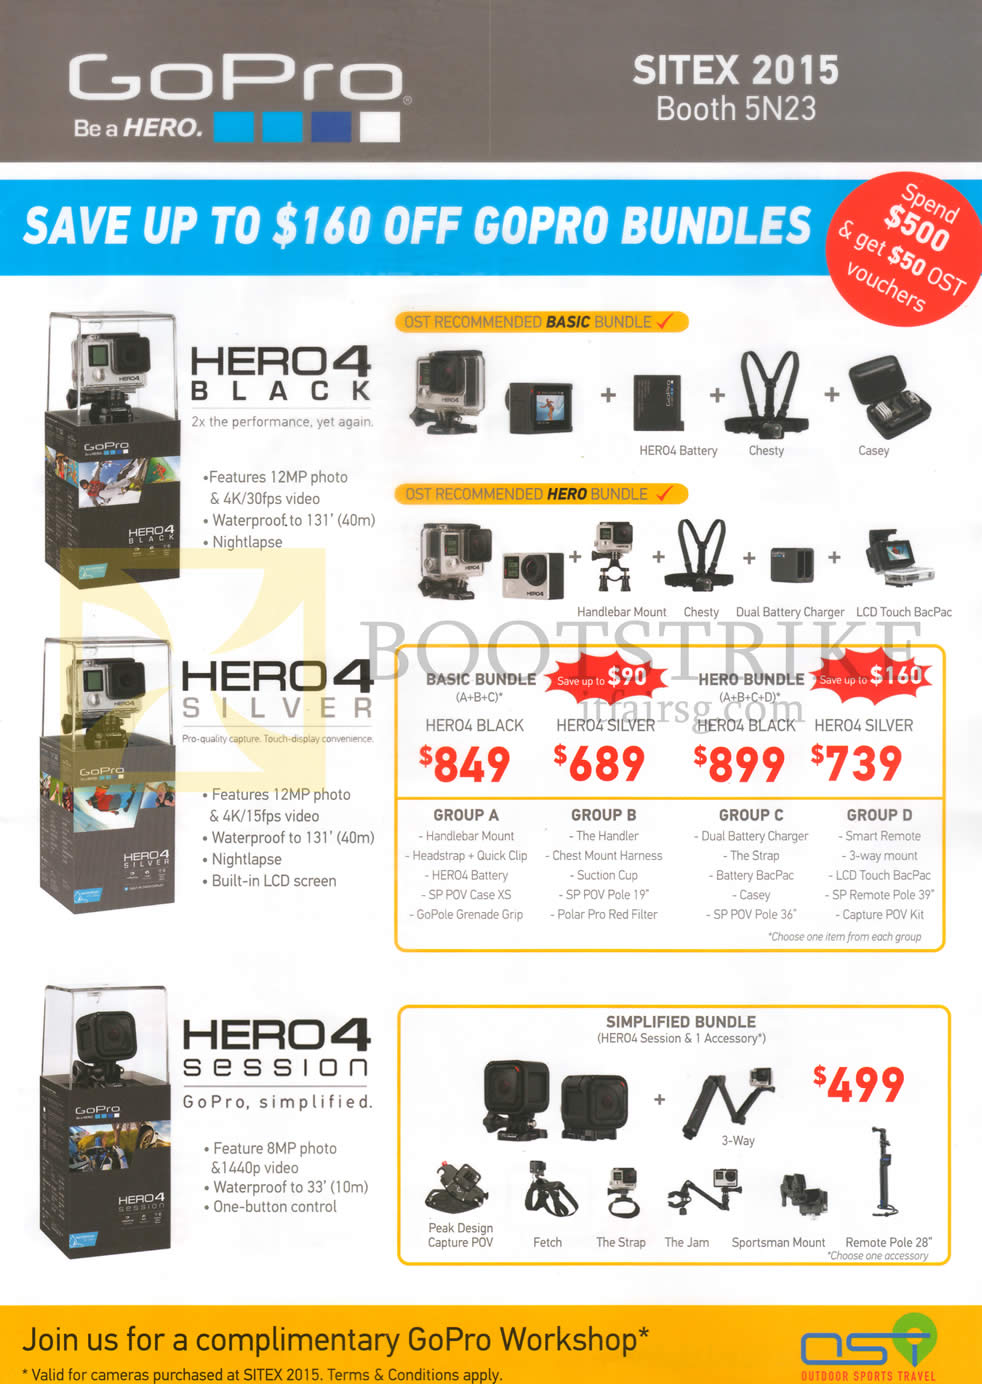 SITEX 2015 Price List Image Brochure Of OST GoPro Action Cams Bundles Hero4 Black